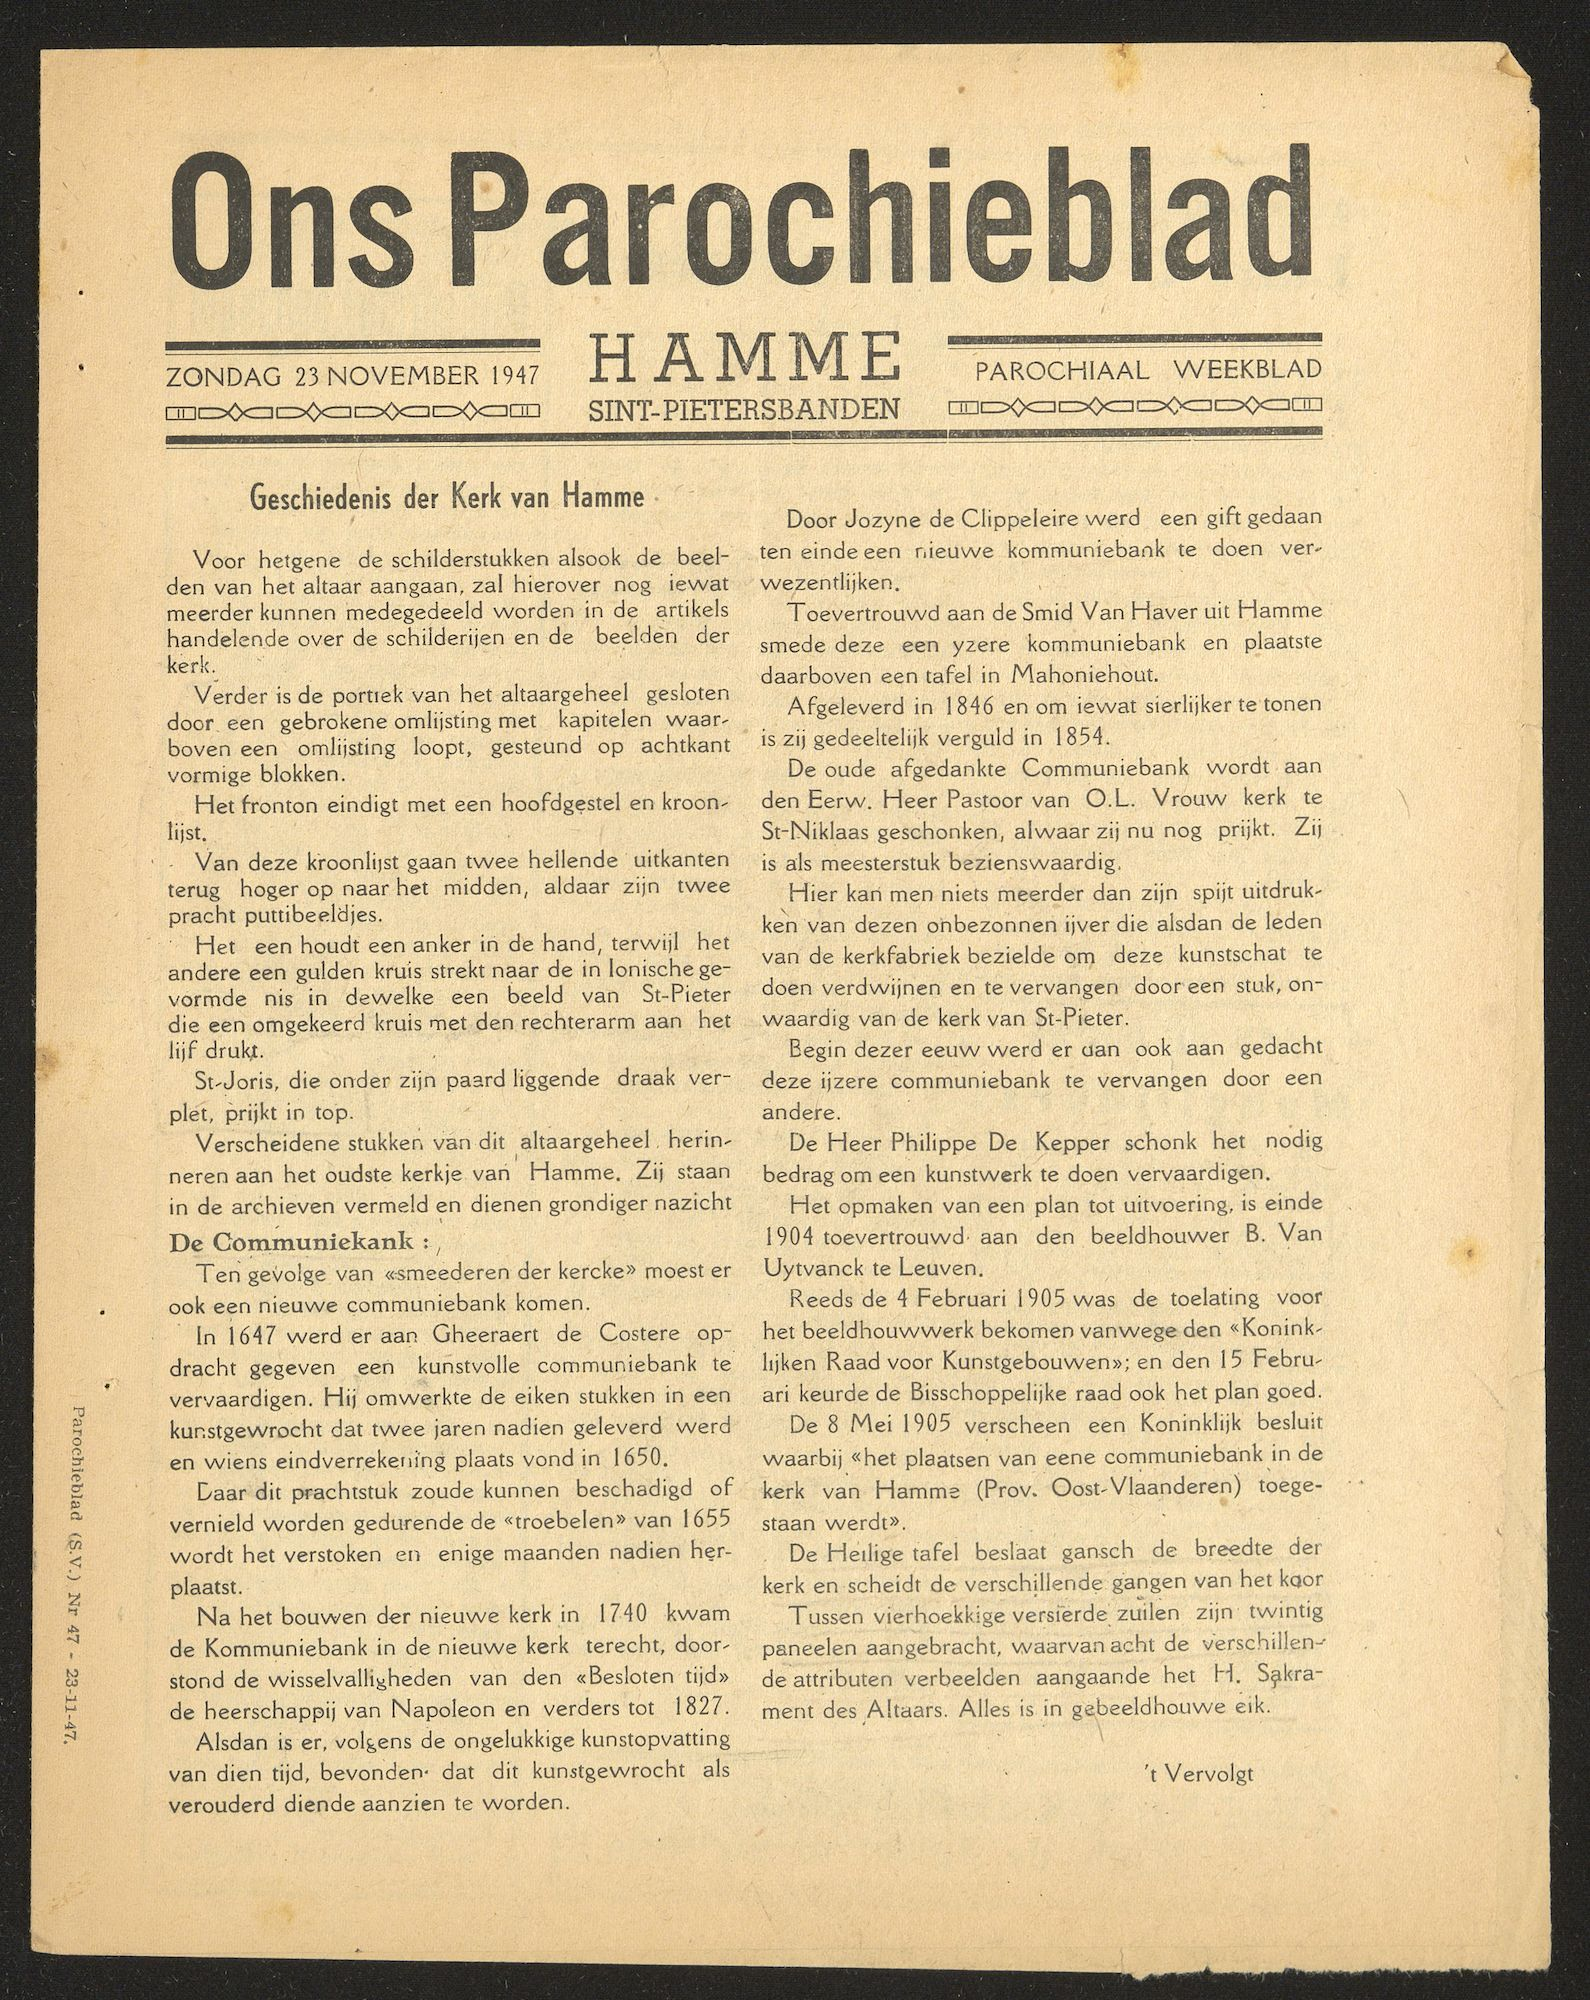 ONS PAROCHIEBLAD 1947-11-23 p1